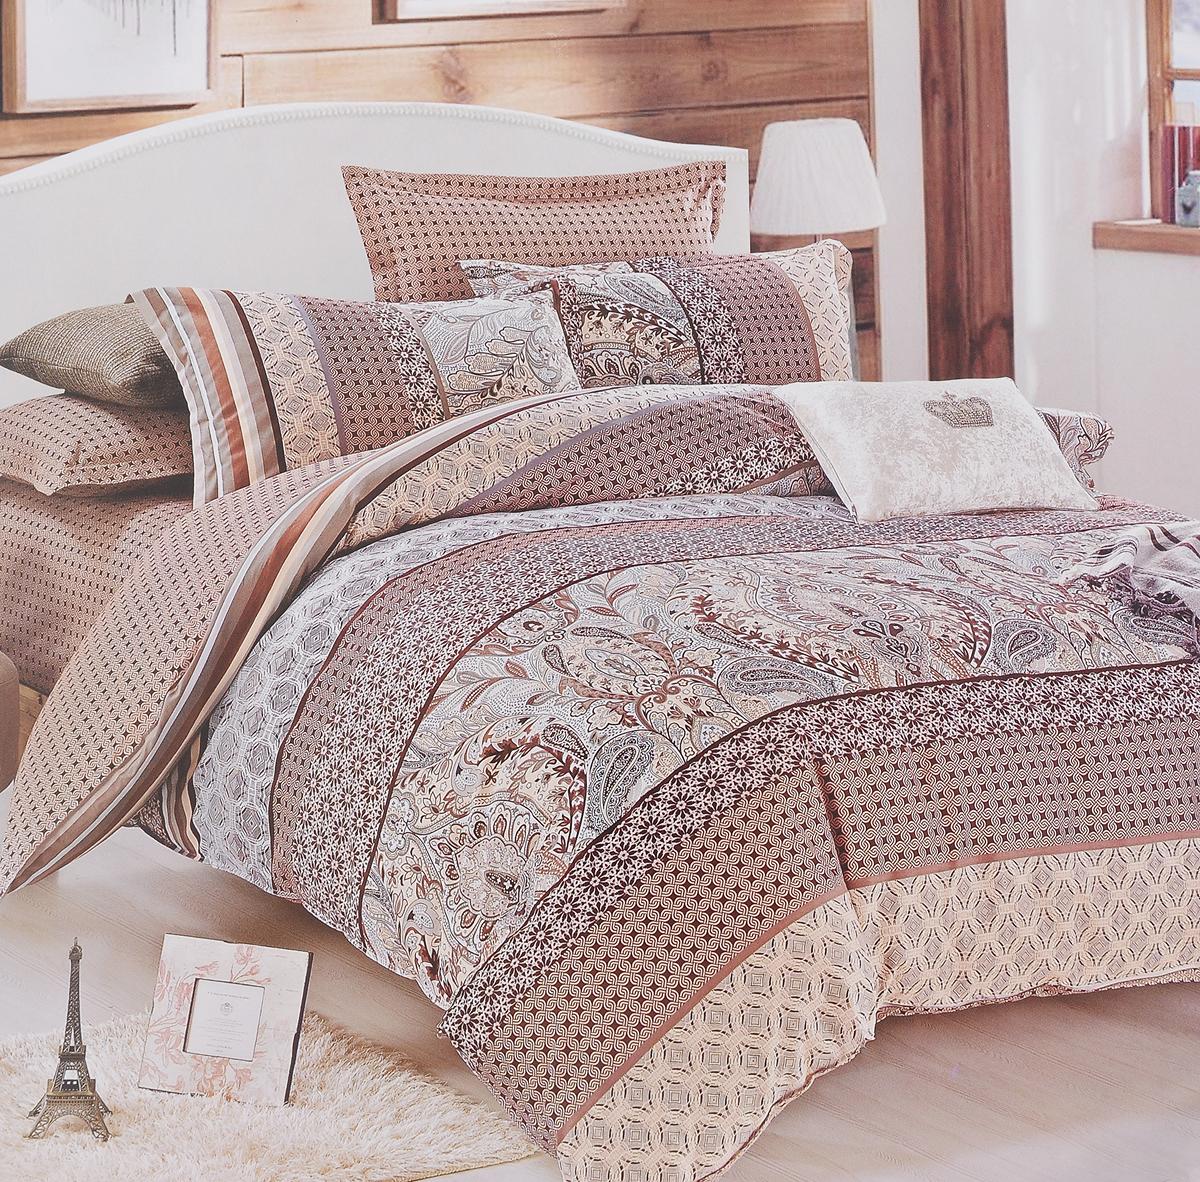 Комплект белья Classic by T Сеймур, 1,5-спальный, наволочки 50х70